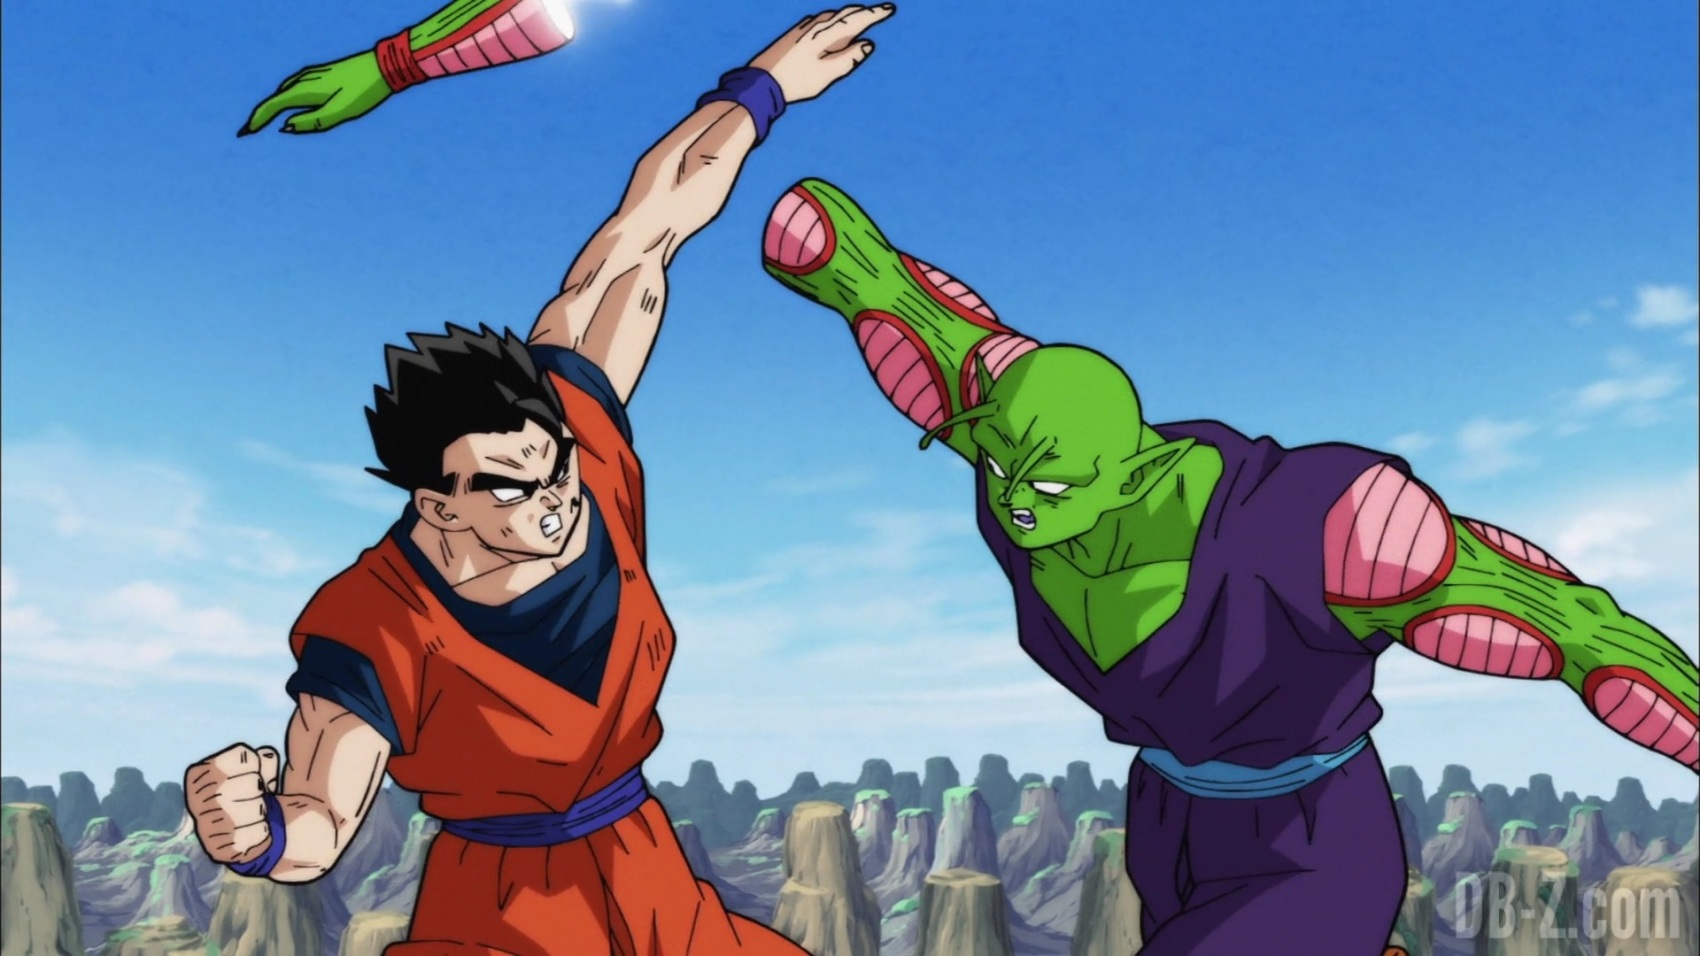 Dragon-Ball-Super-Episode-88-images-31